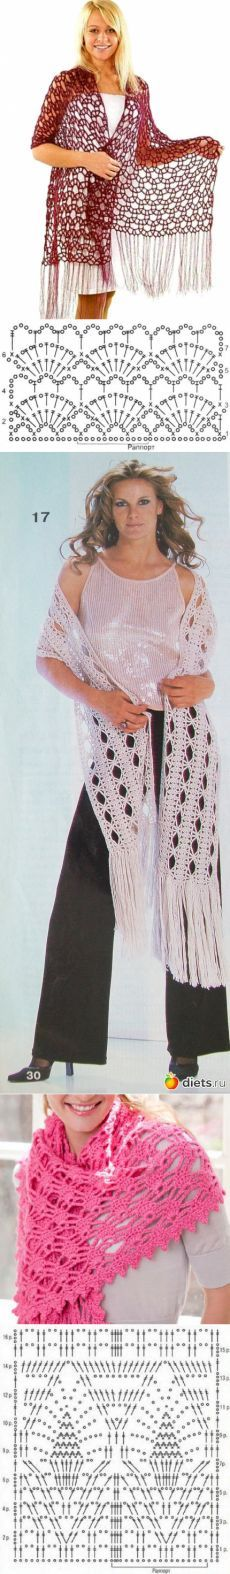 Будь модной! вязание крючком палантин. Модная одежда, #haken, gratis teltekening, haakschema, stola, omslagdoek, shawl, #crochet, free chart, diagram, shawl, wrap